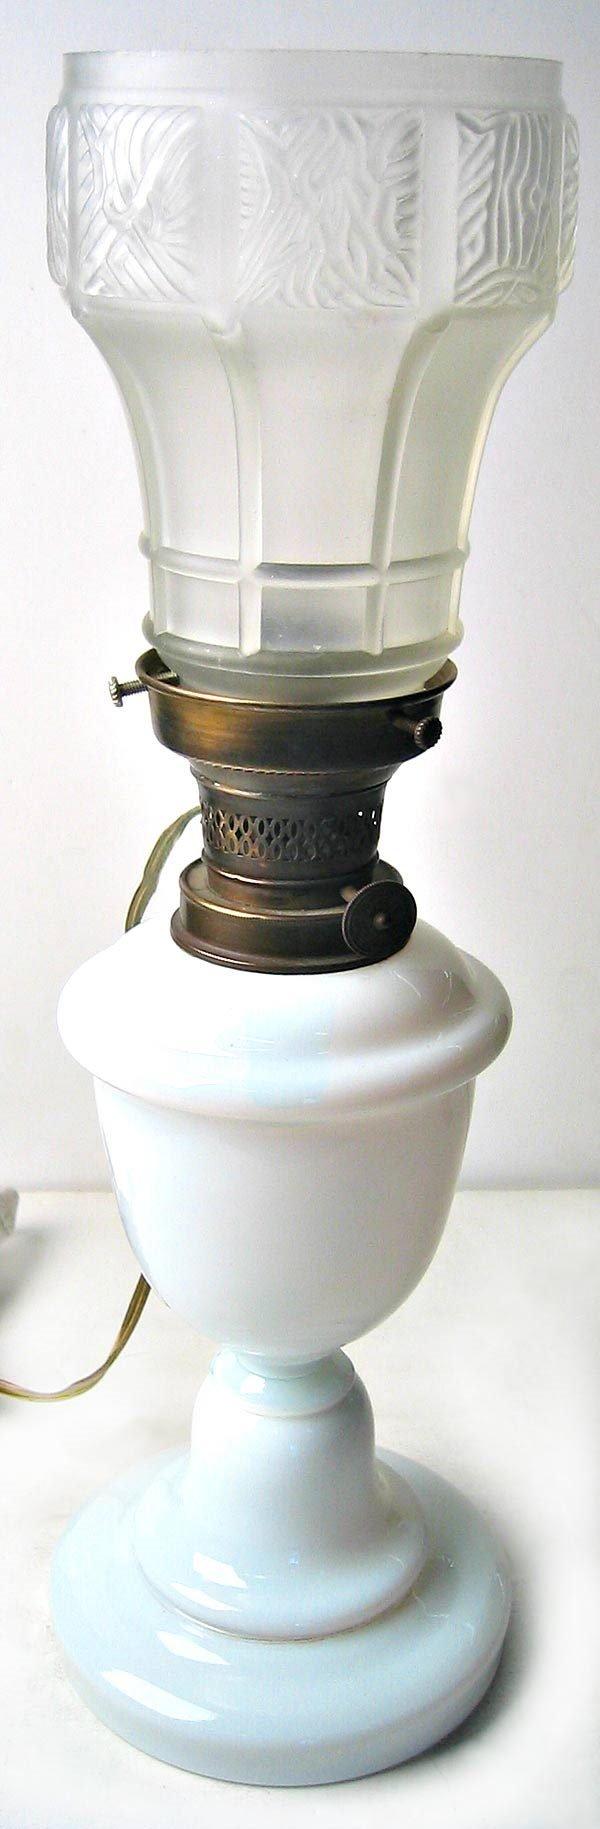 3973: Milk glass table lamp